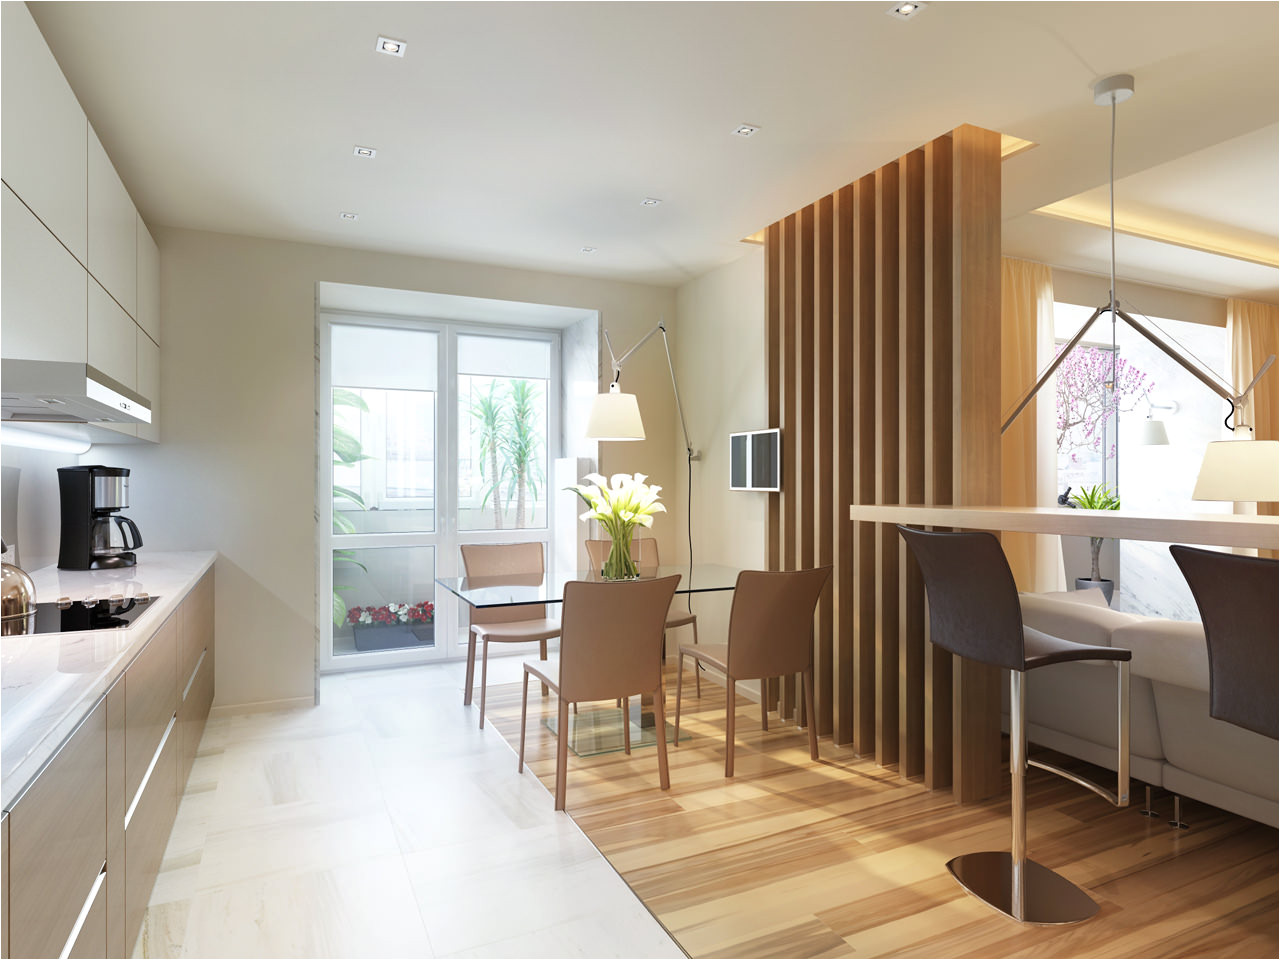 decoracion interiores modernos construye hogar diseno cocina comedor moderno con separador ambientes disec o decoracion sala with decoracin de interiores